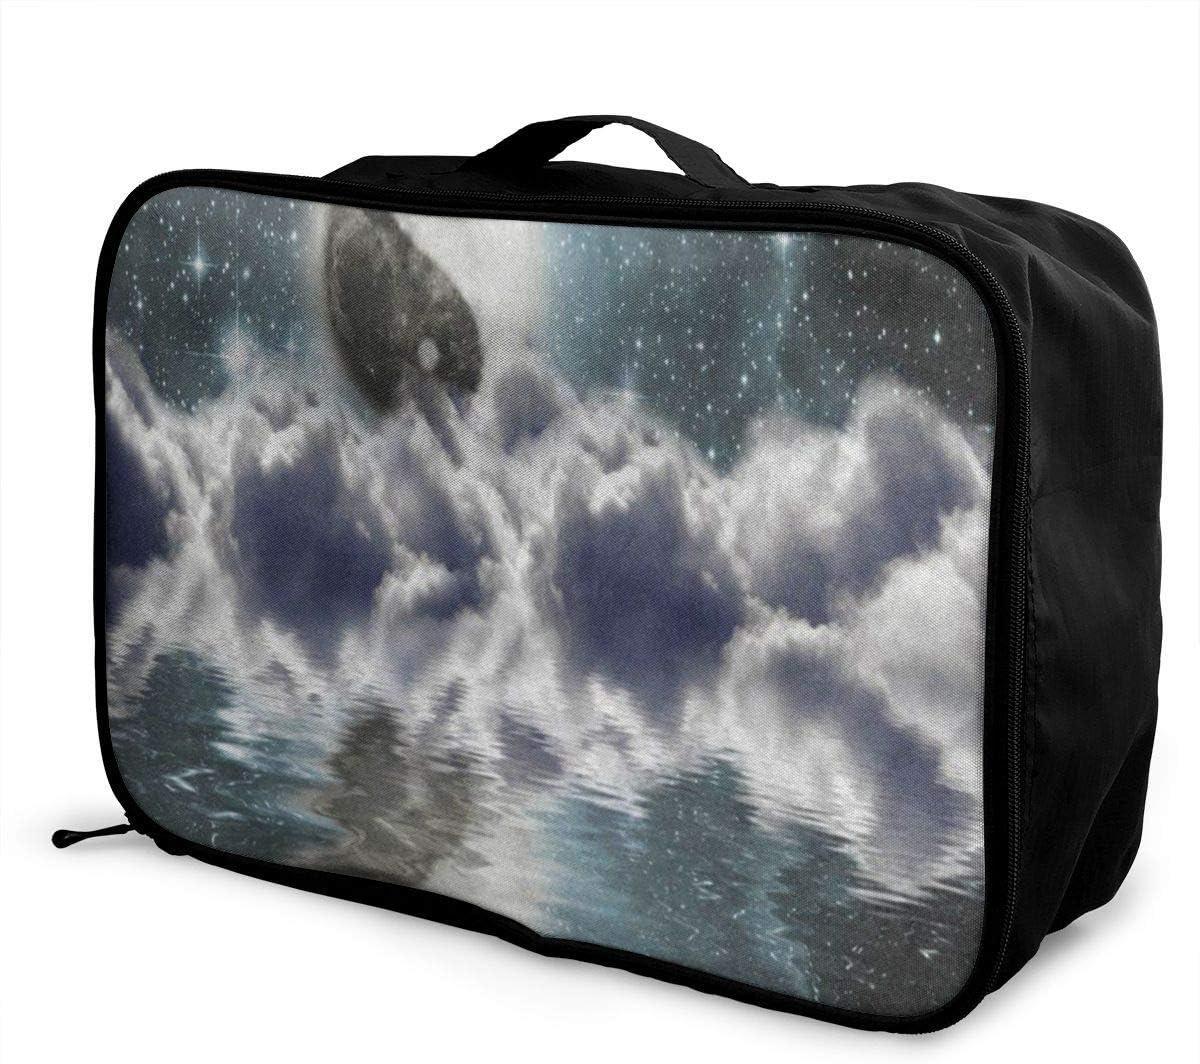 Travel Bags Moon Yin And Yang Cloud Ocean Portable Suitcase Vintage Trolley Handle Luggage Bag